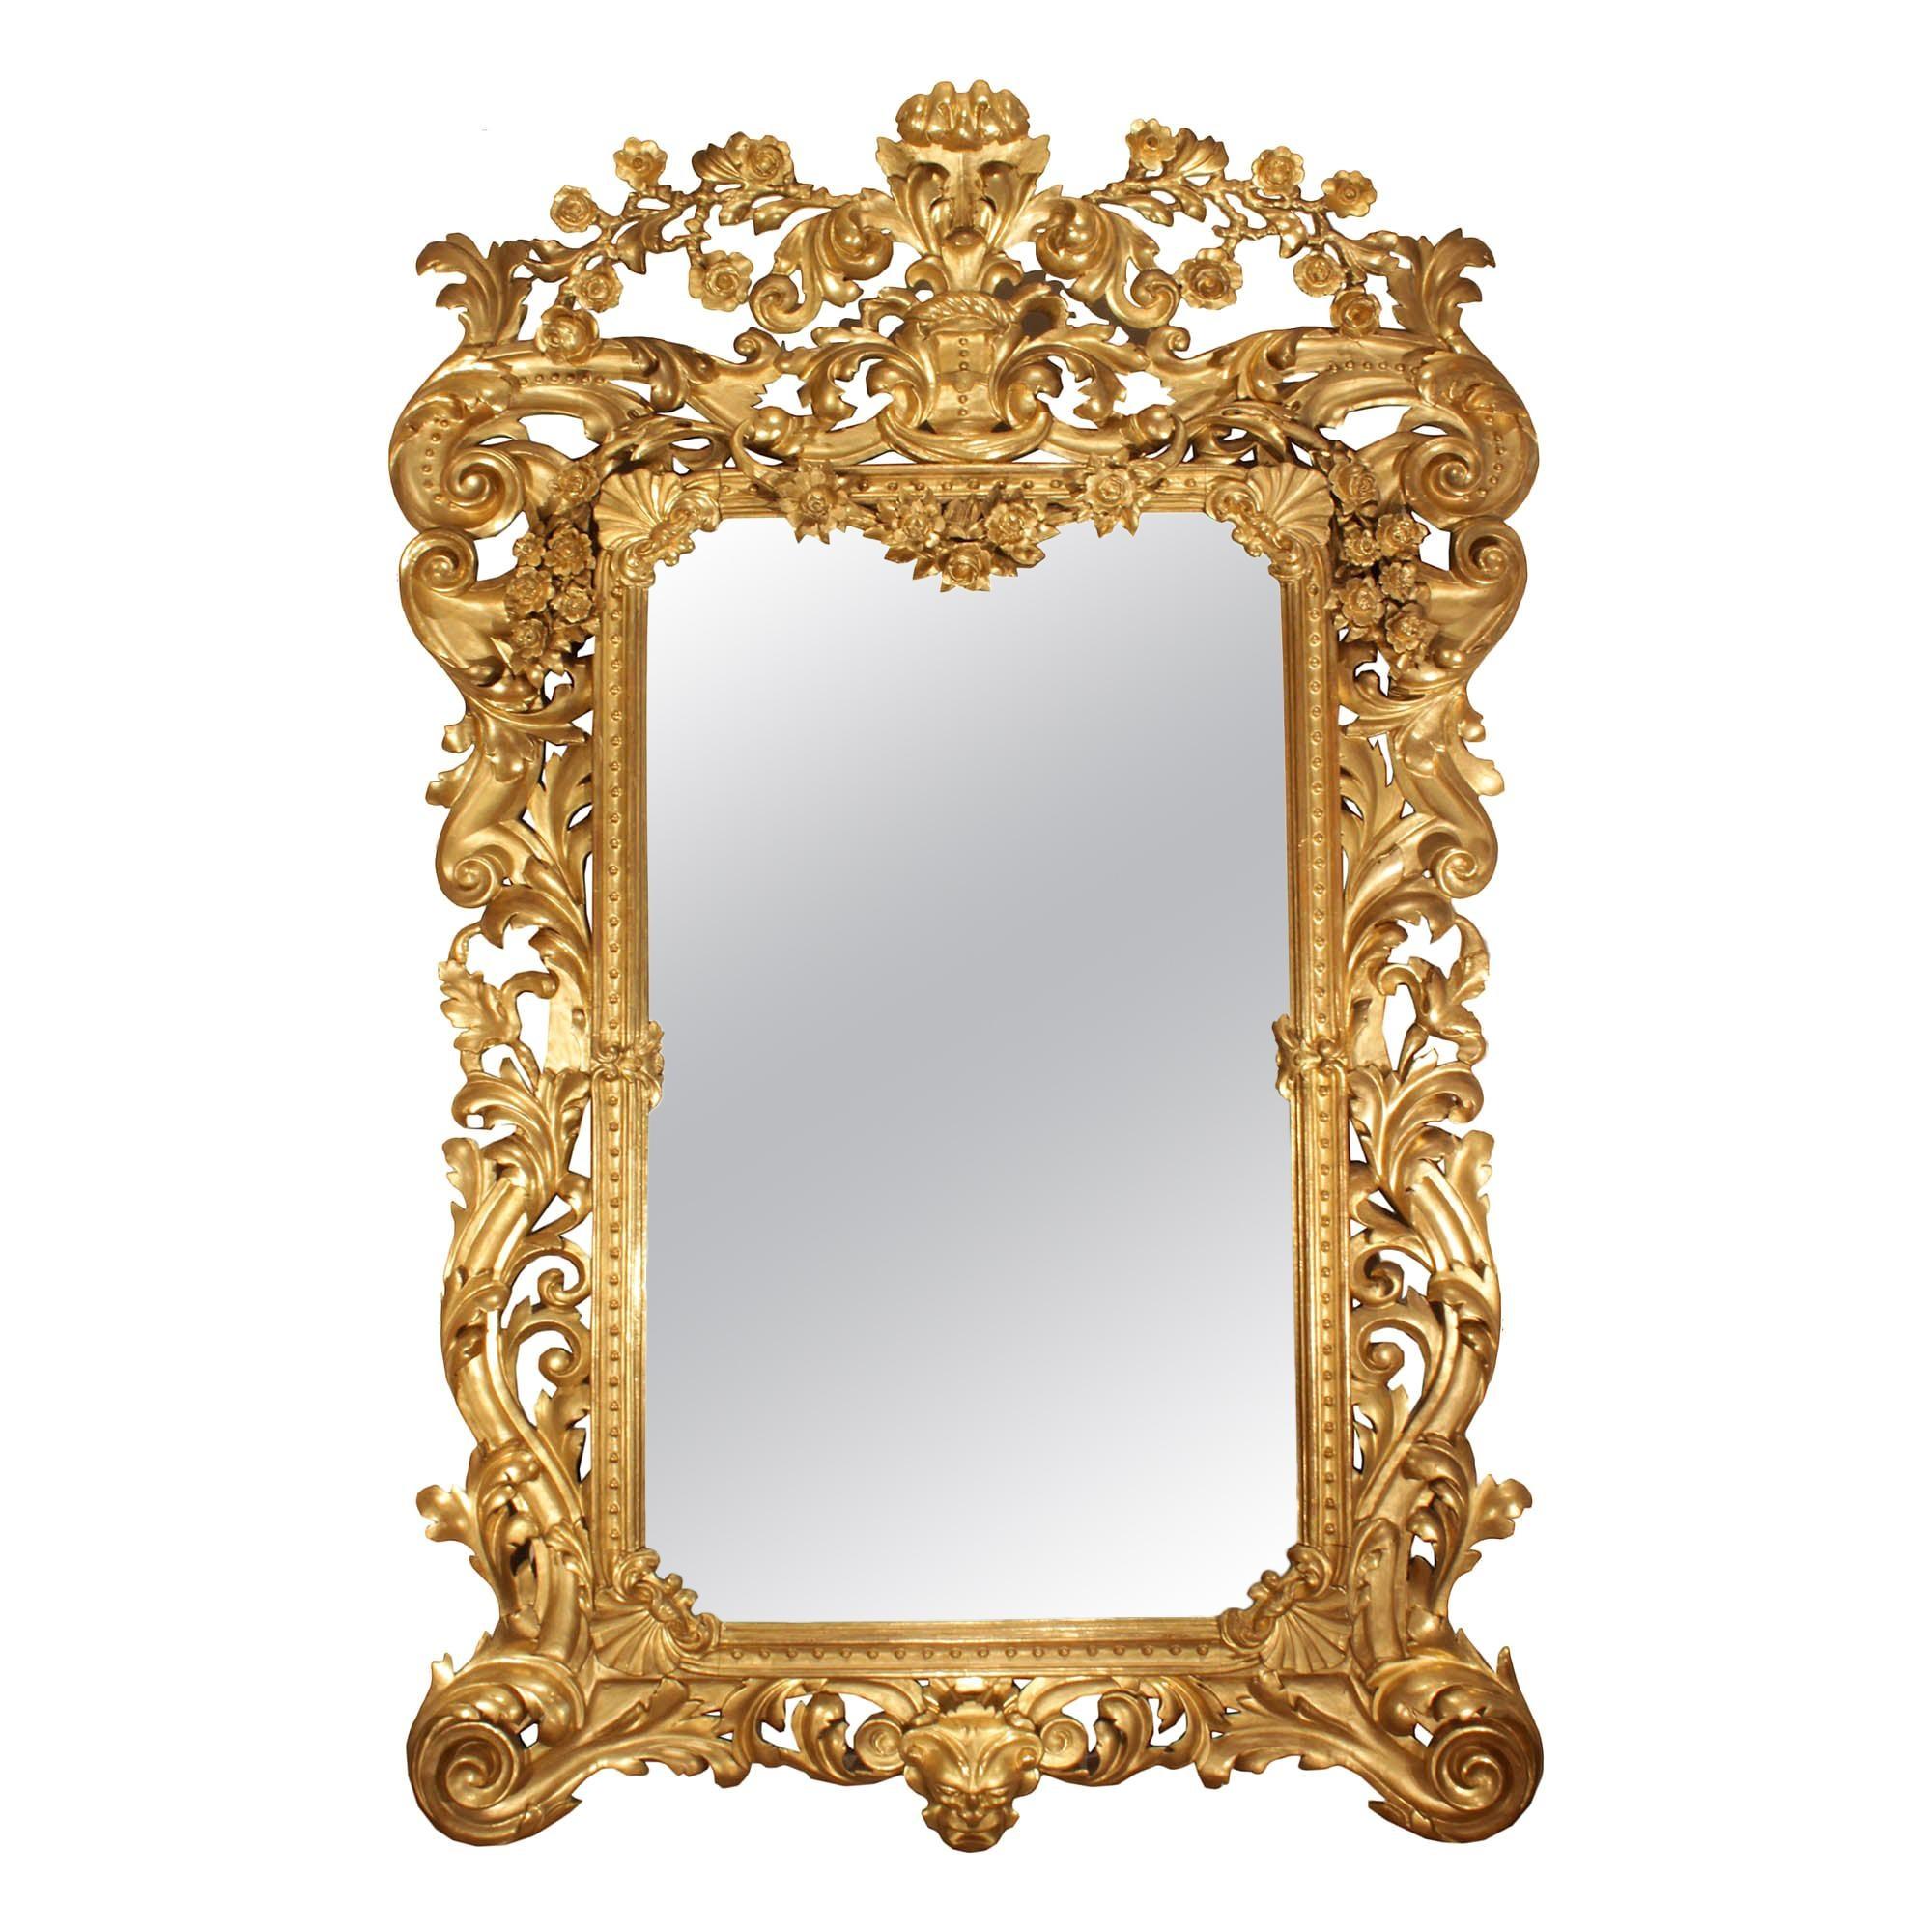 Italian 19th Century Rococo Style Giltwood Mirror